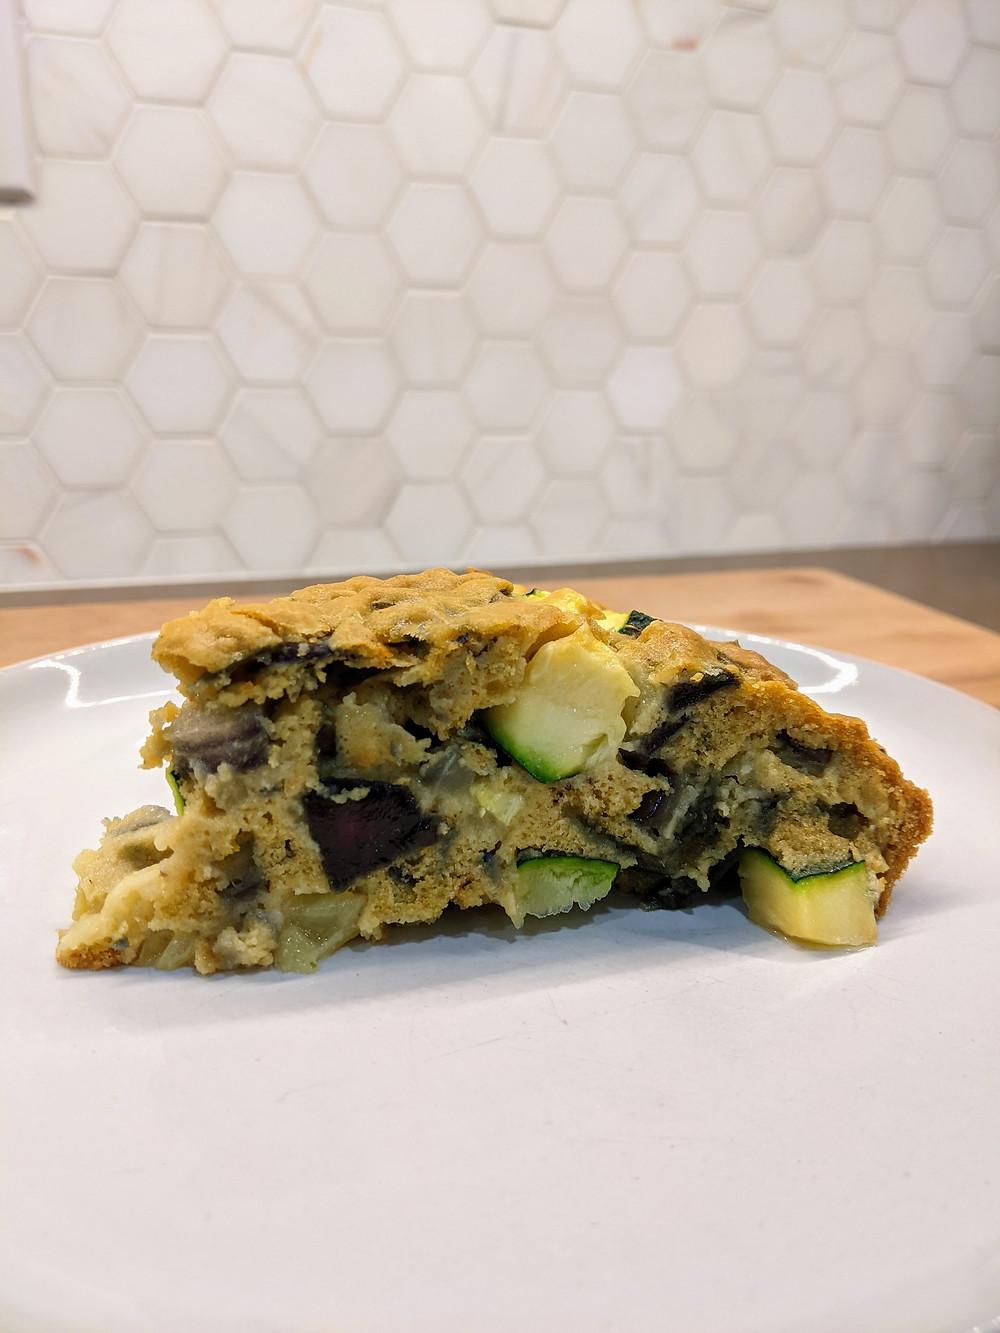 Zucchini Pie - amanda macgregor - Joseph Centineo - food allergy recipes - gluten free